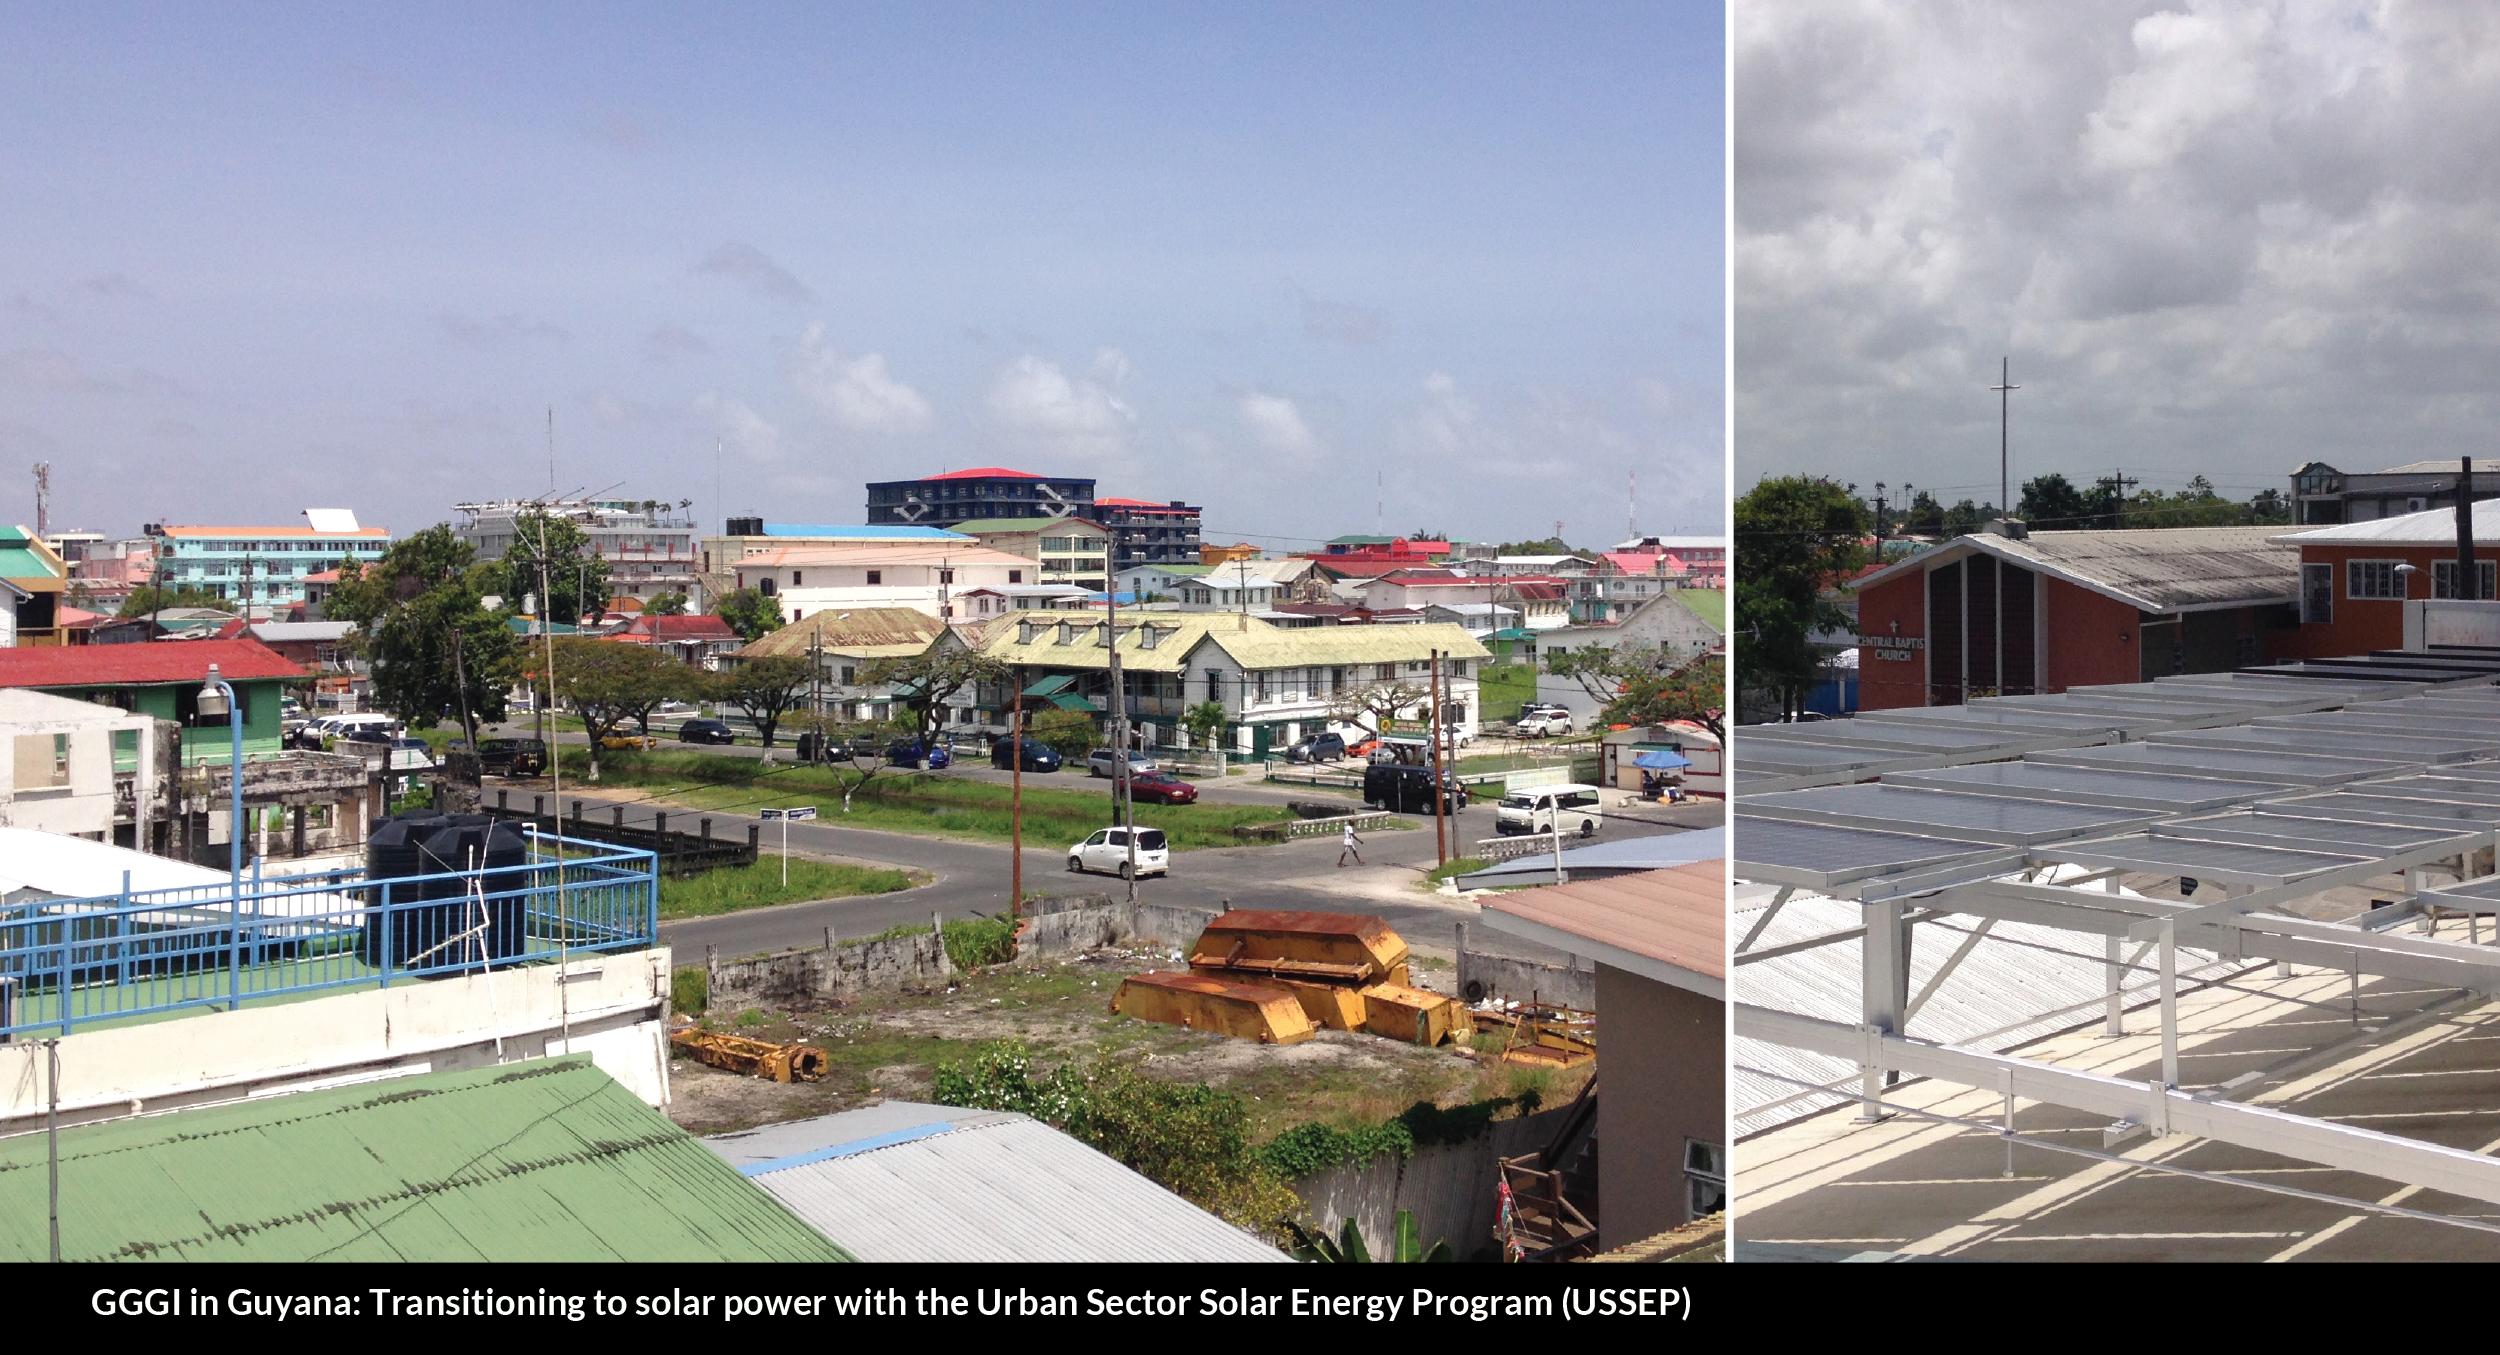 SS_Guyana_foto2-01